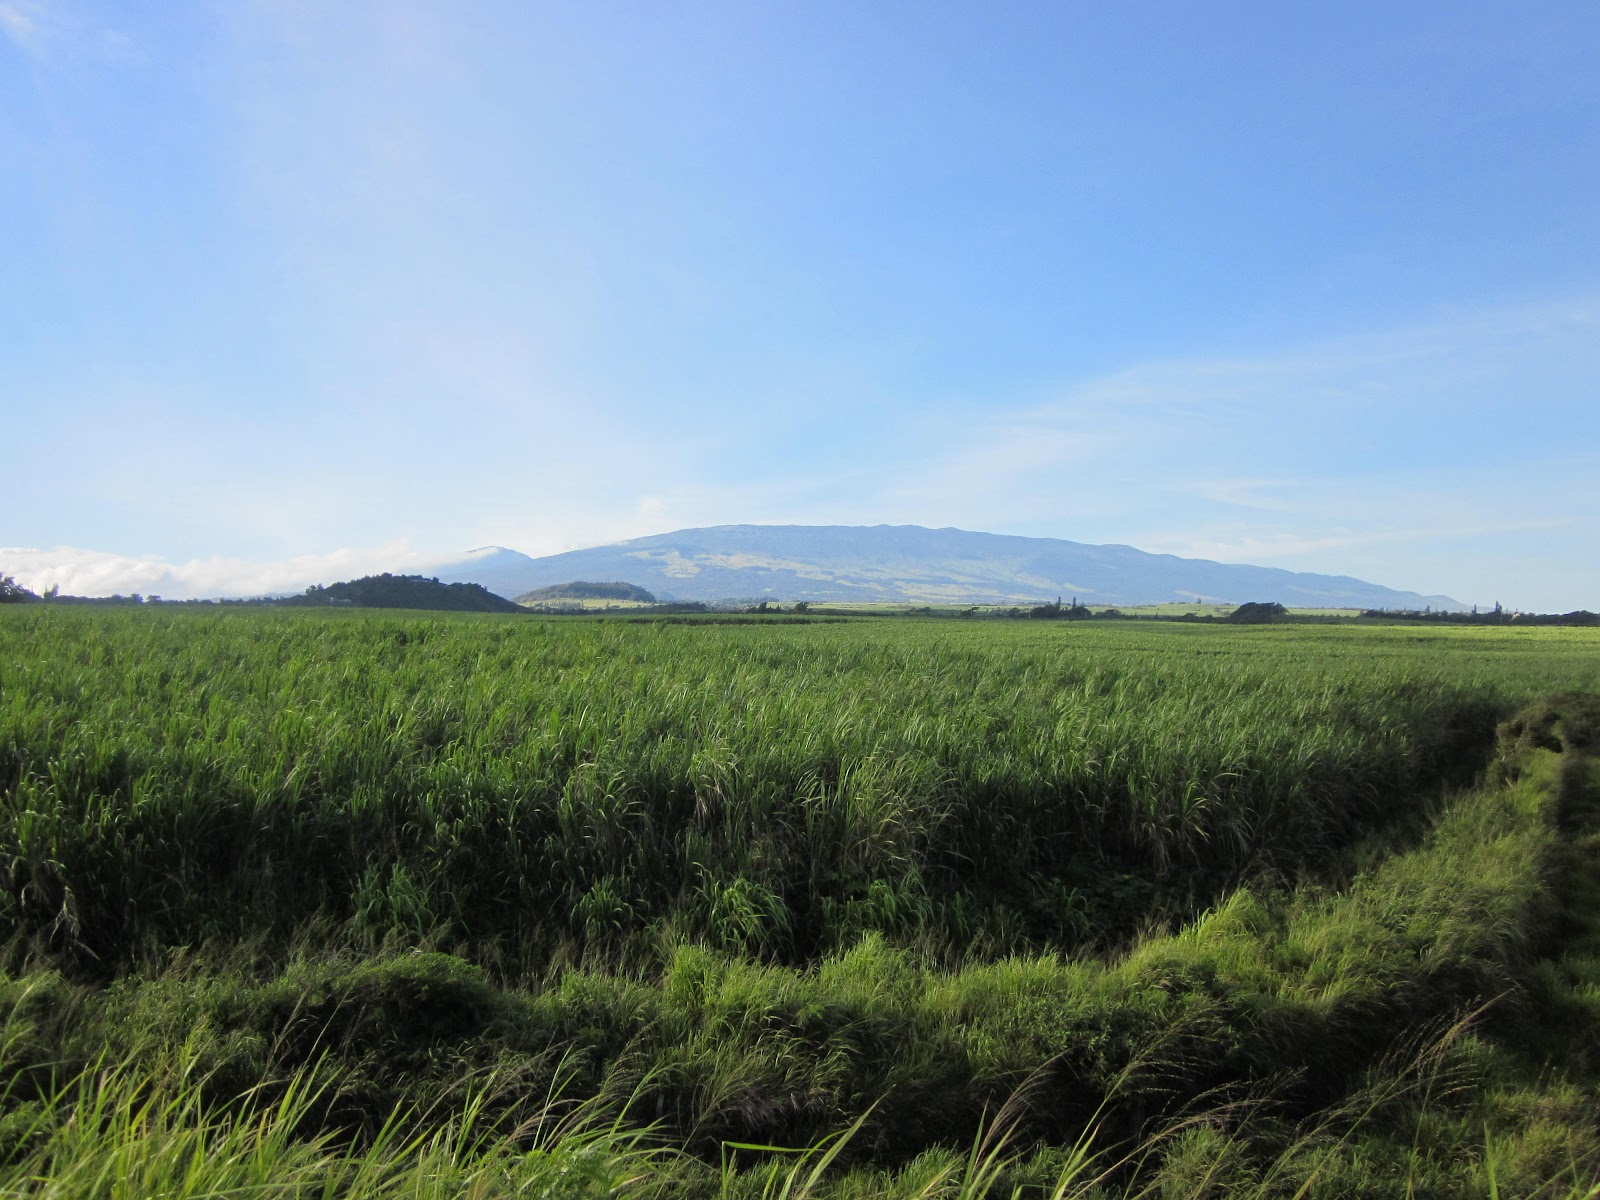 Cycling Haleakala Volcano - as seen from Hana Highway